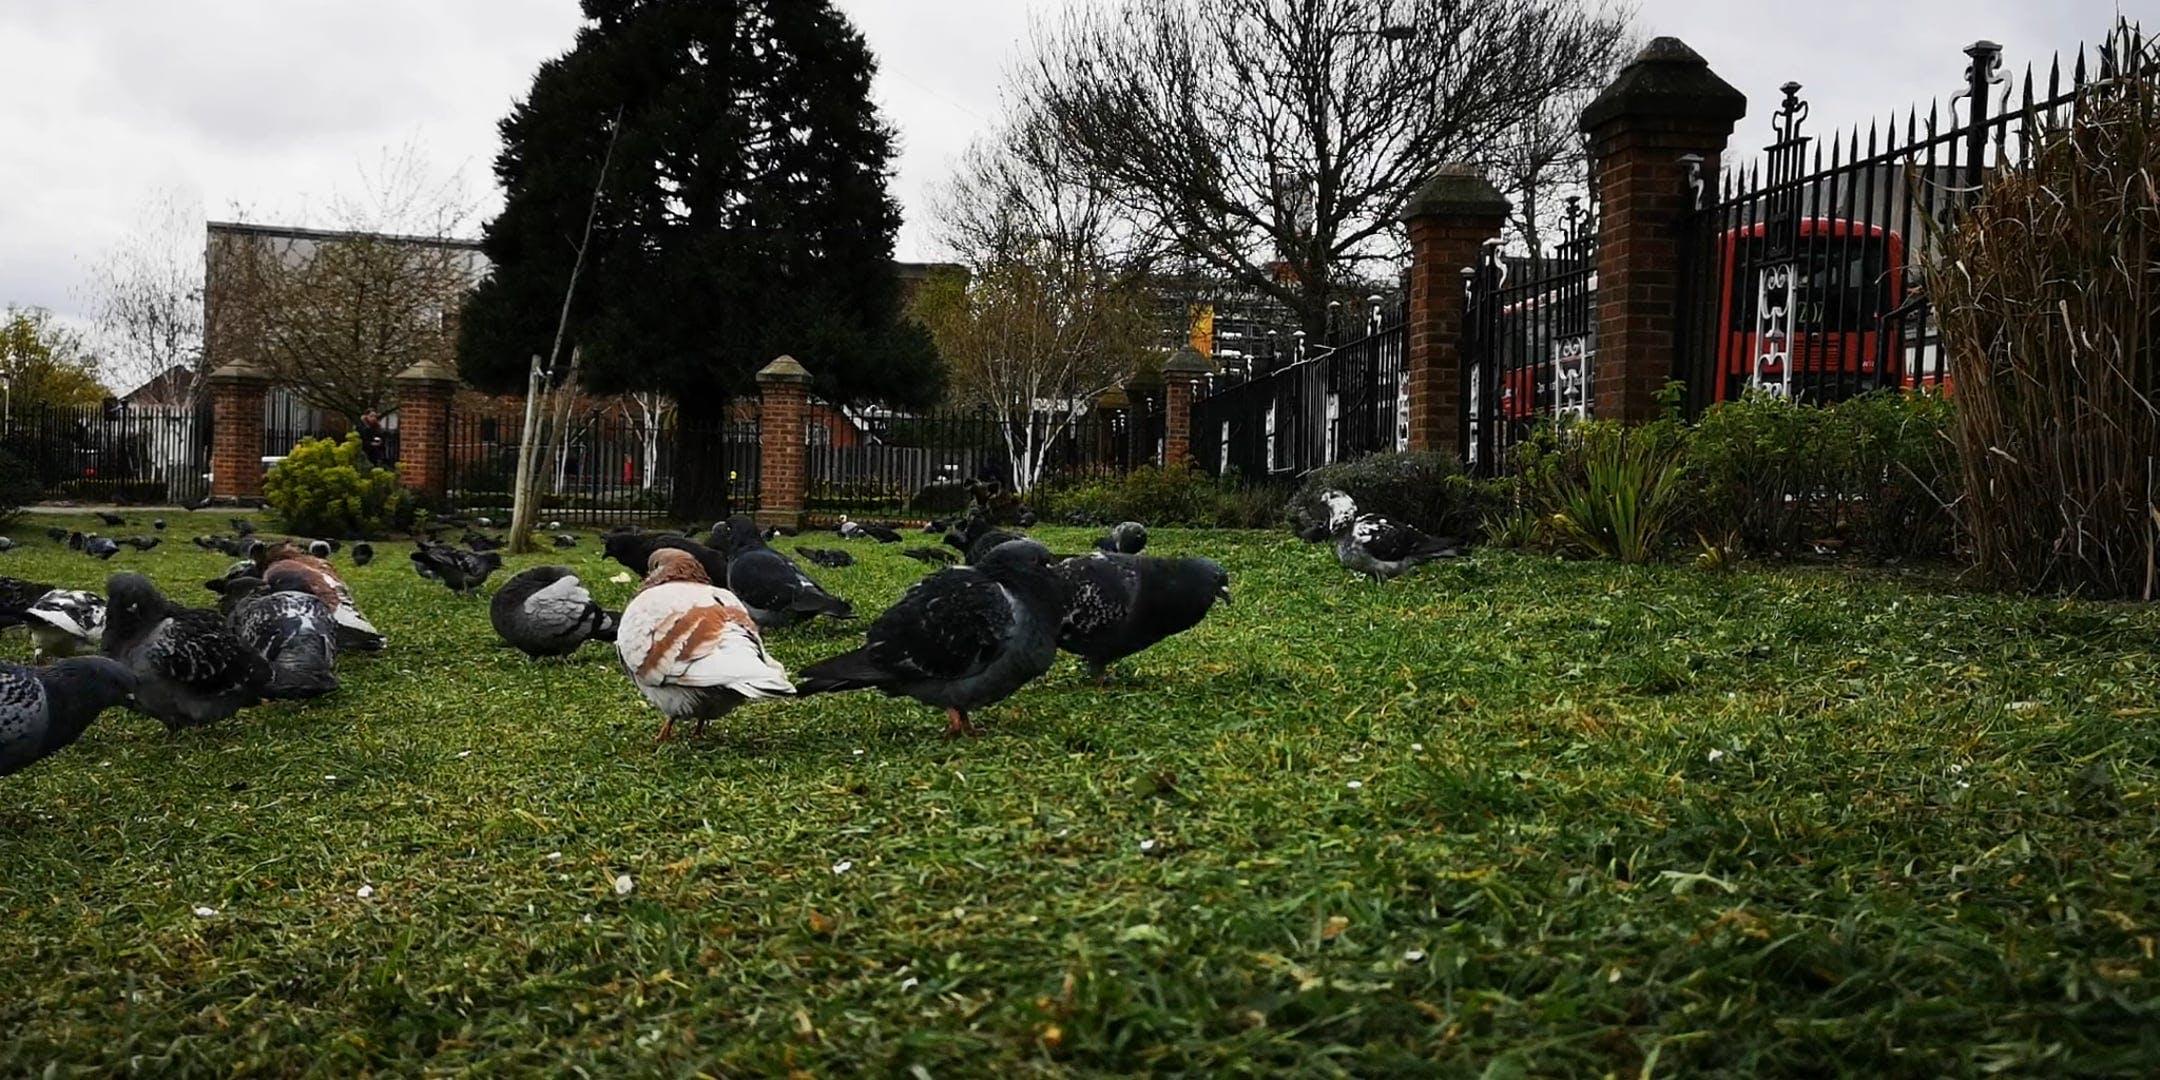 Pigeons Feeding On Grass